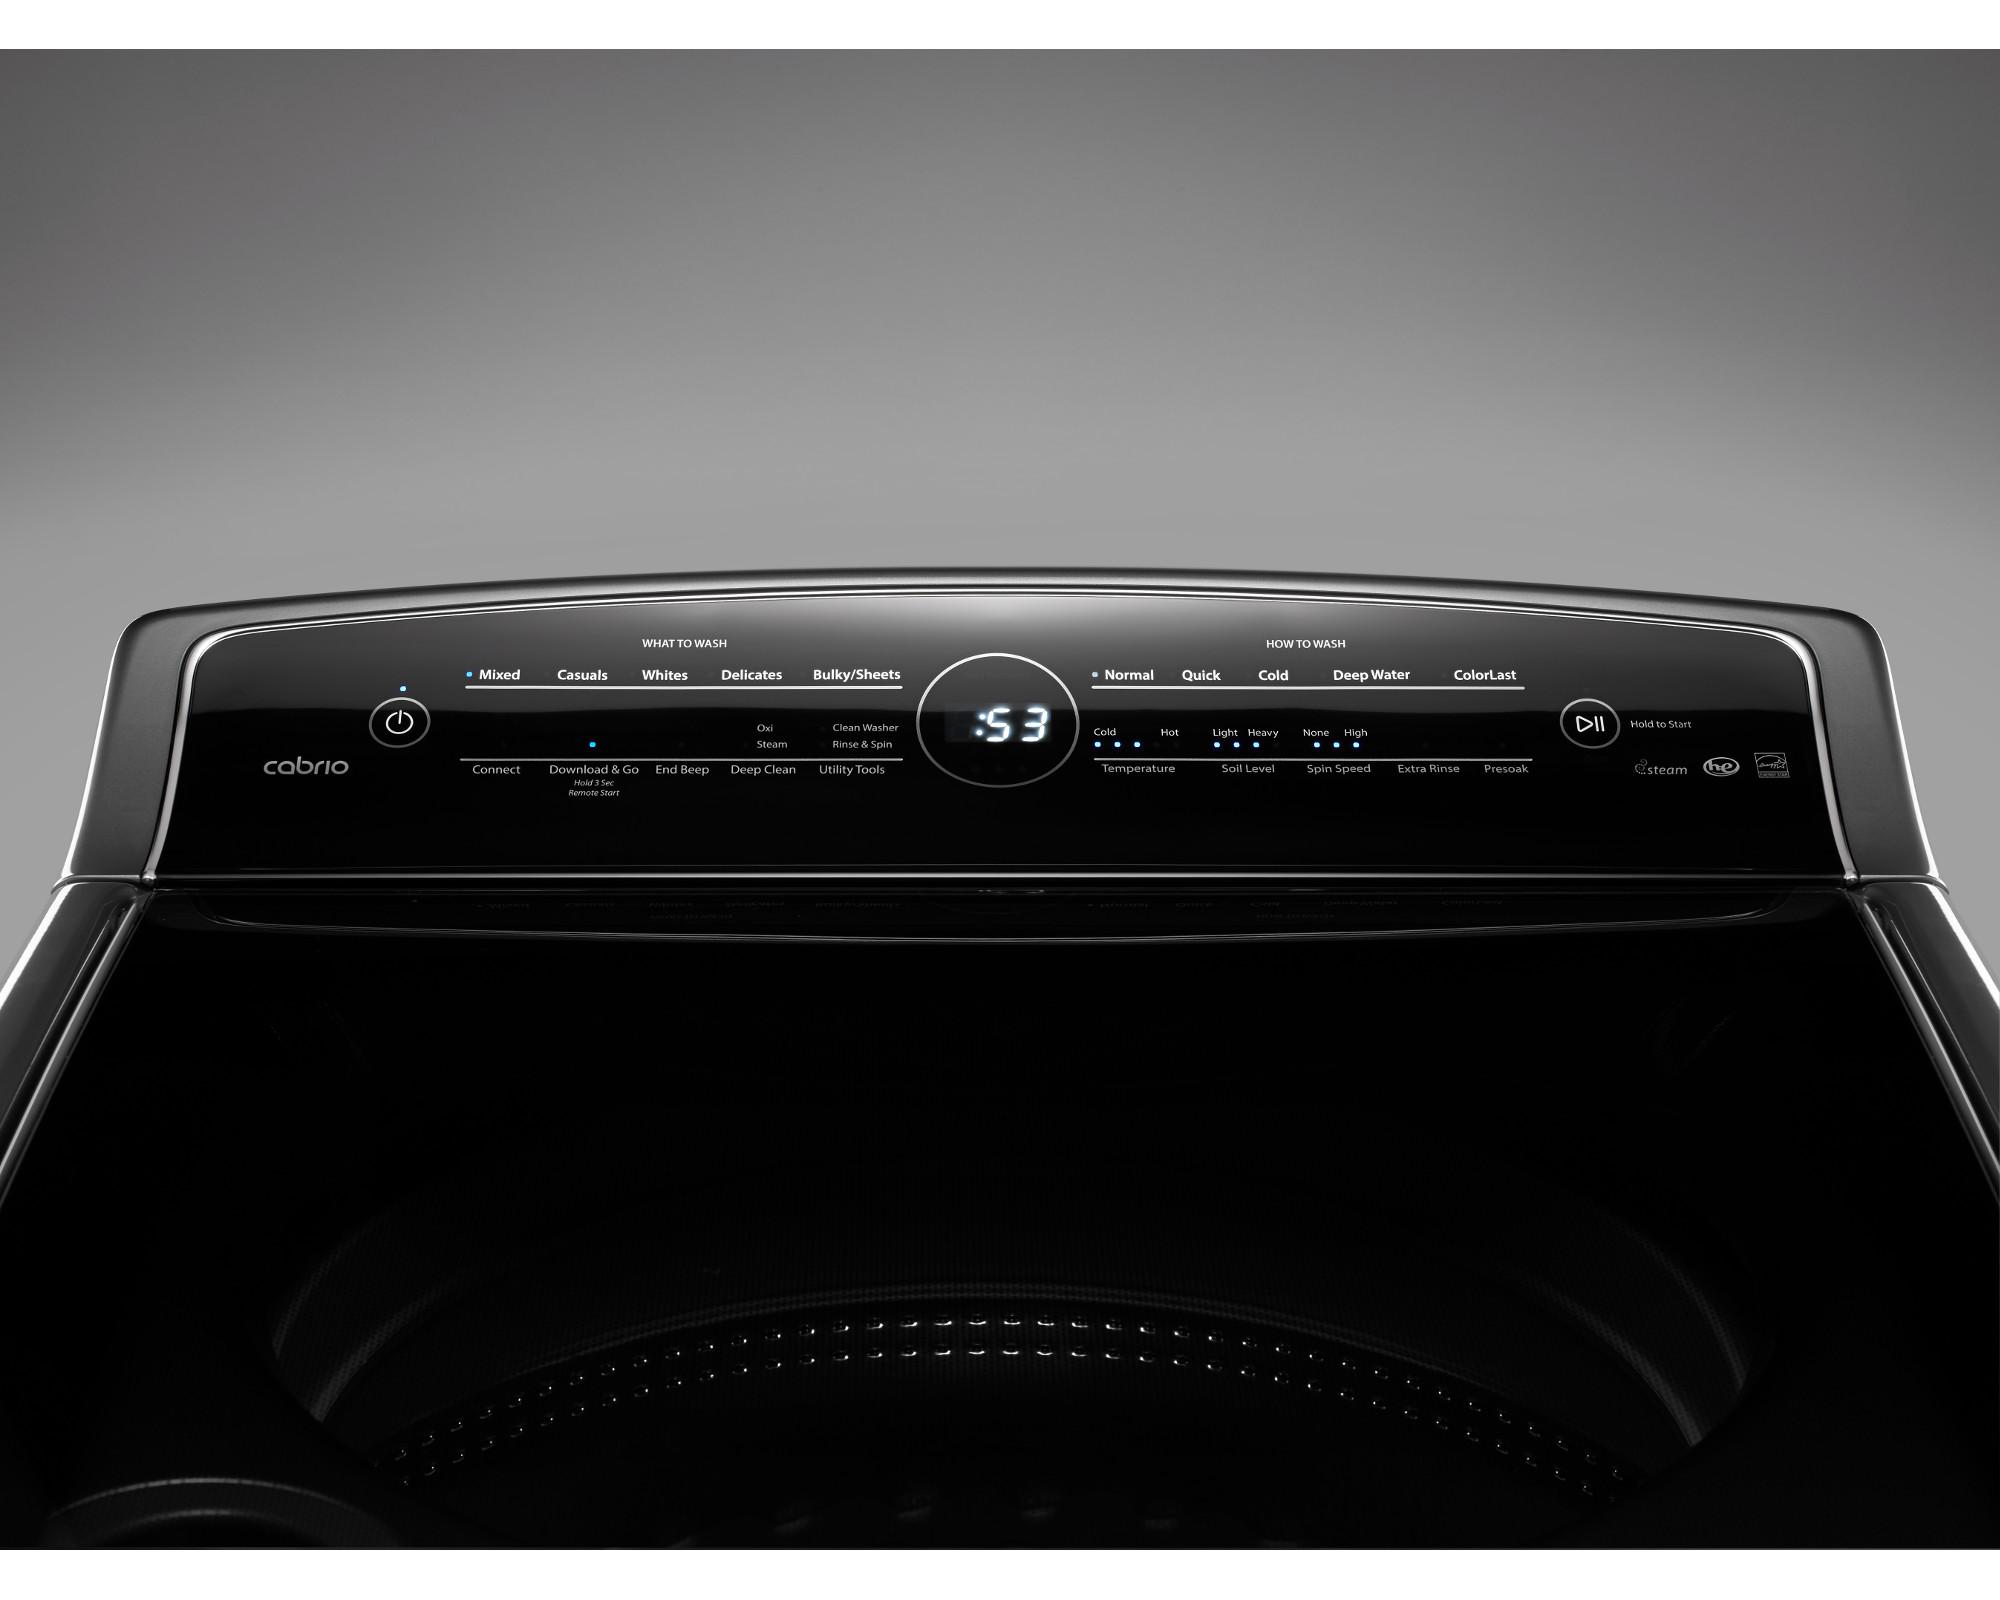 Whirlpool WTW8700EC 5.3 cu. ft. Smart Cabrio® Top Load Washer w/ Laundry App - Chrome Shadow